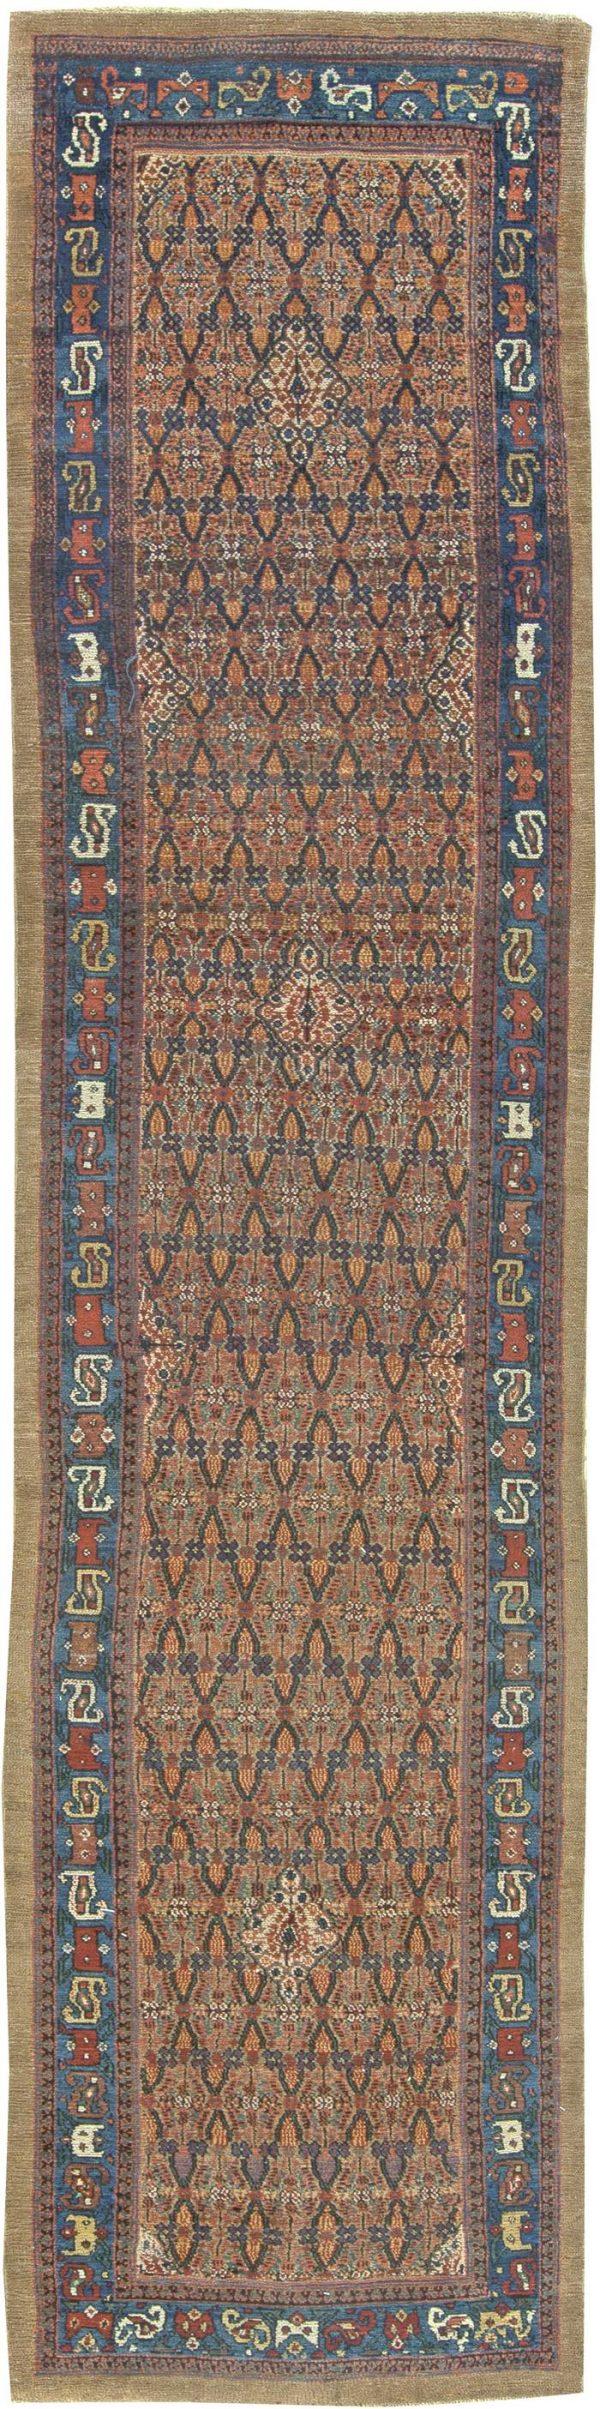 Antique Persian Hamadan Rug BB5978